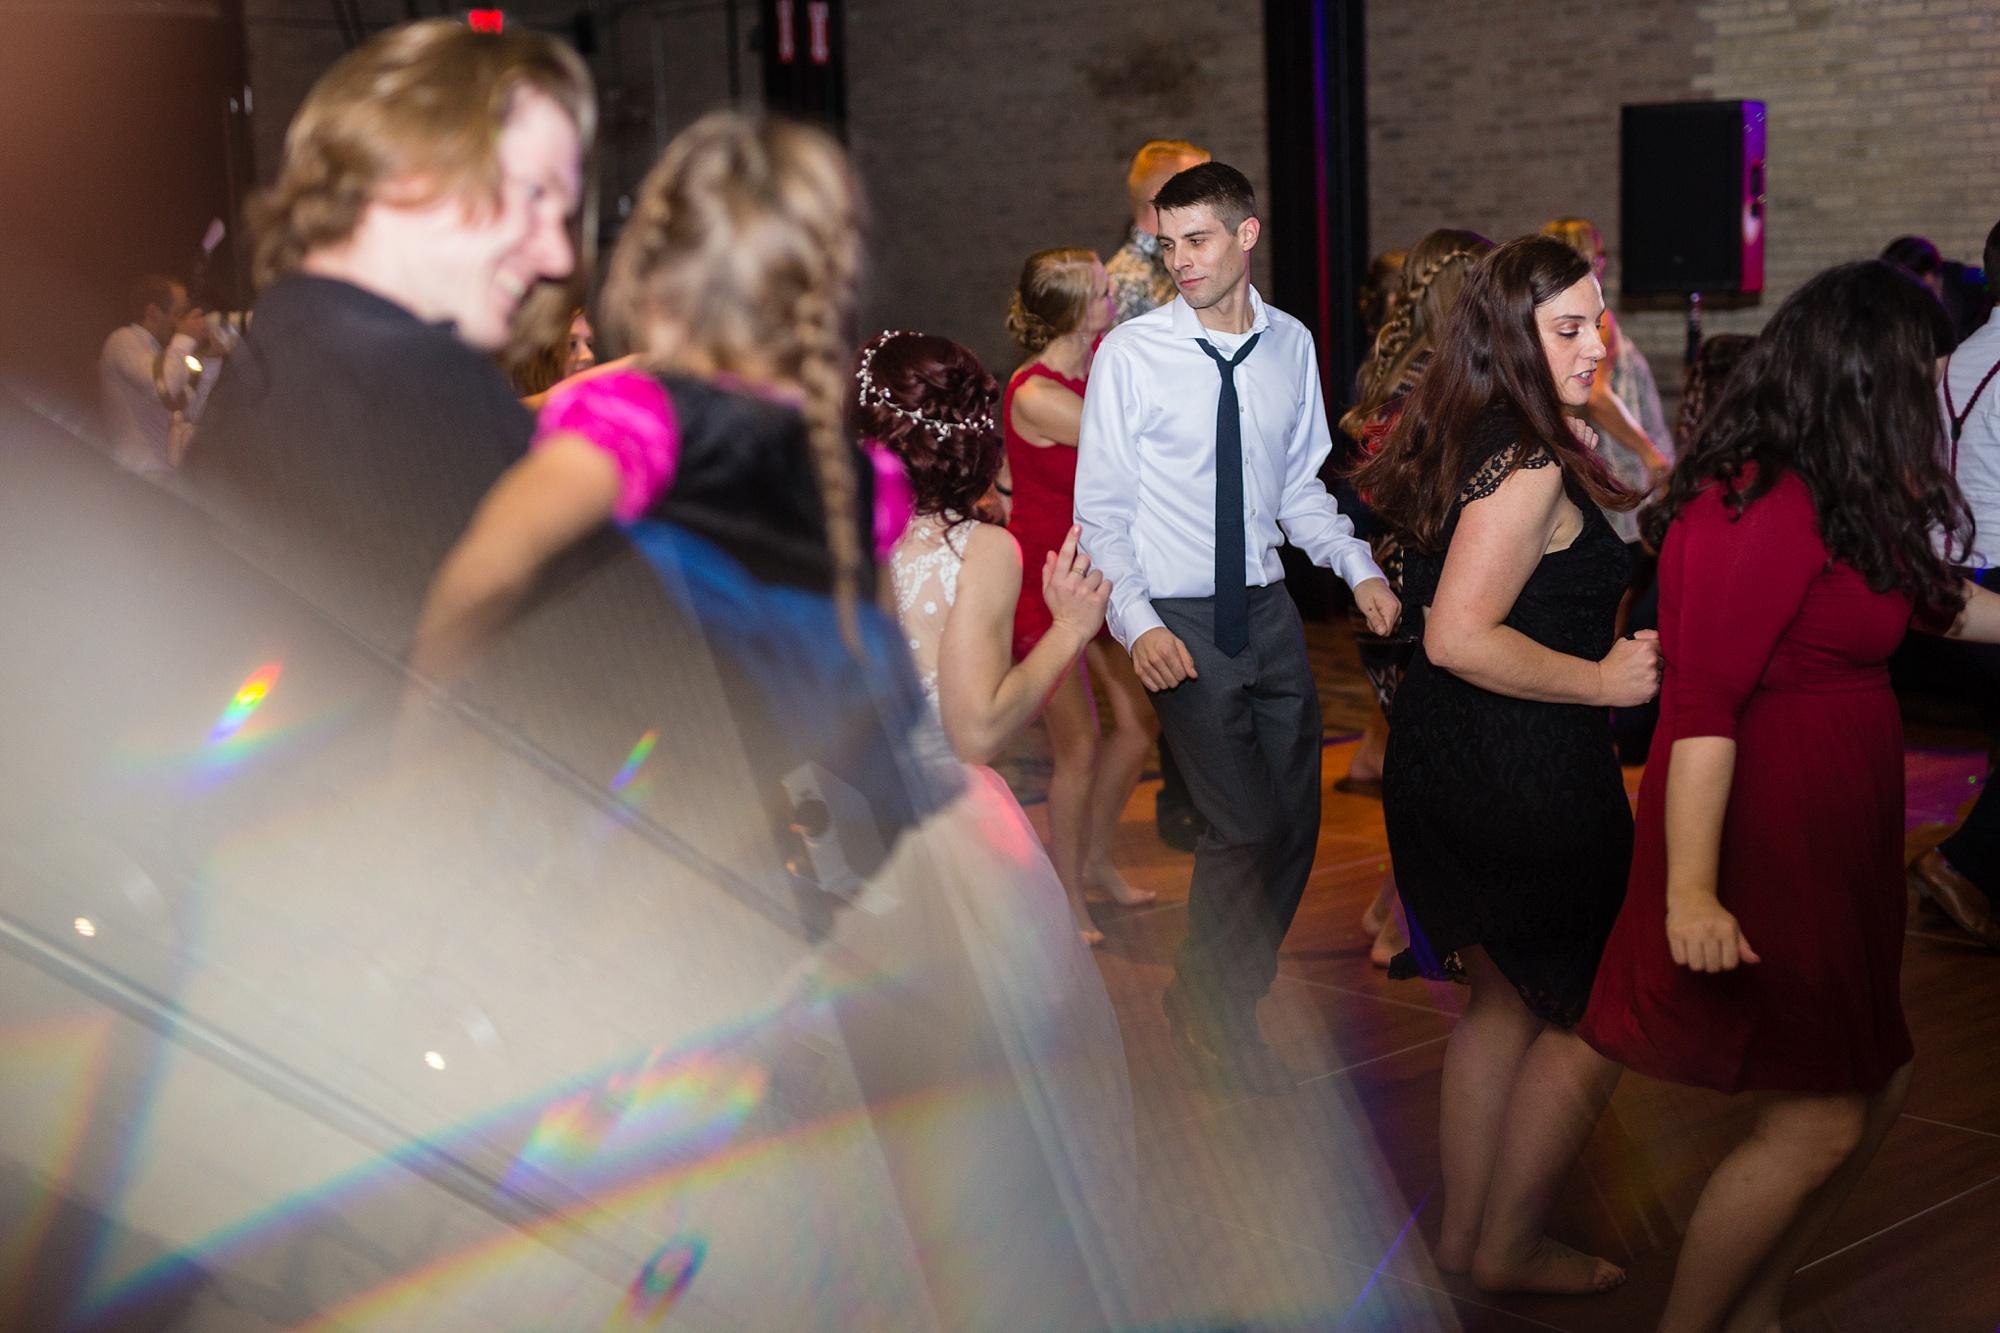 Brandon_Shafer_Photography_Lauren_Ethan_New_Vintage_Place_Grand_Rapids_Wedding_0060.jpg